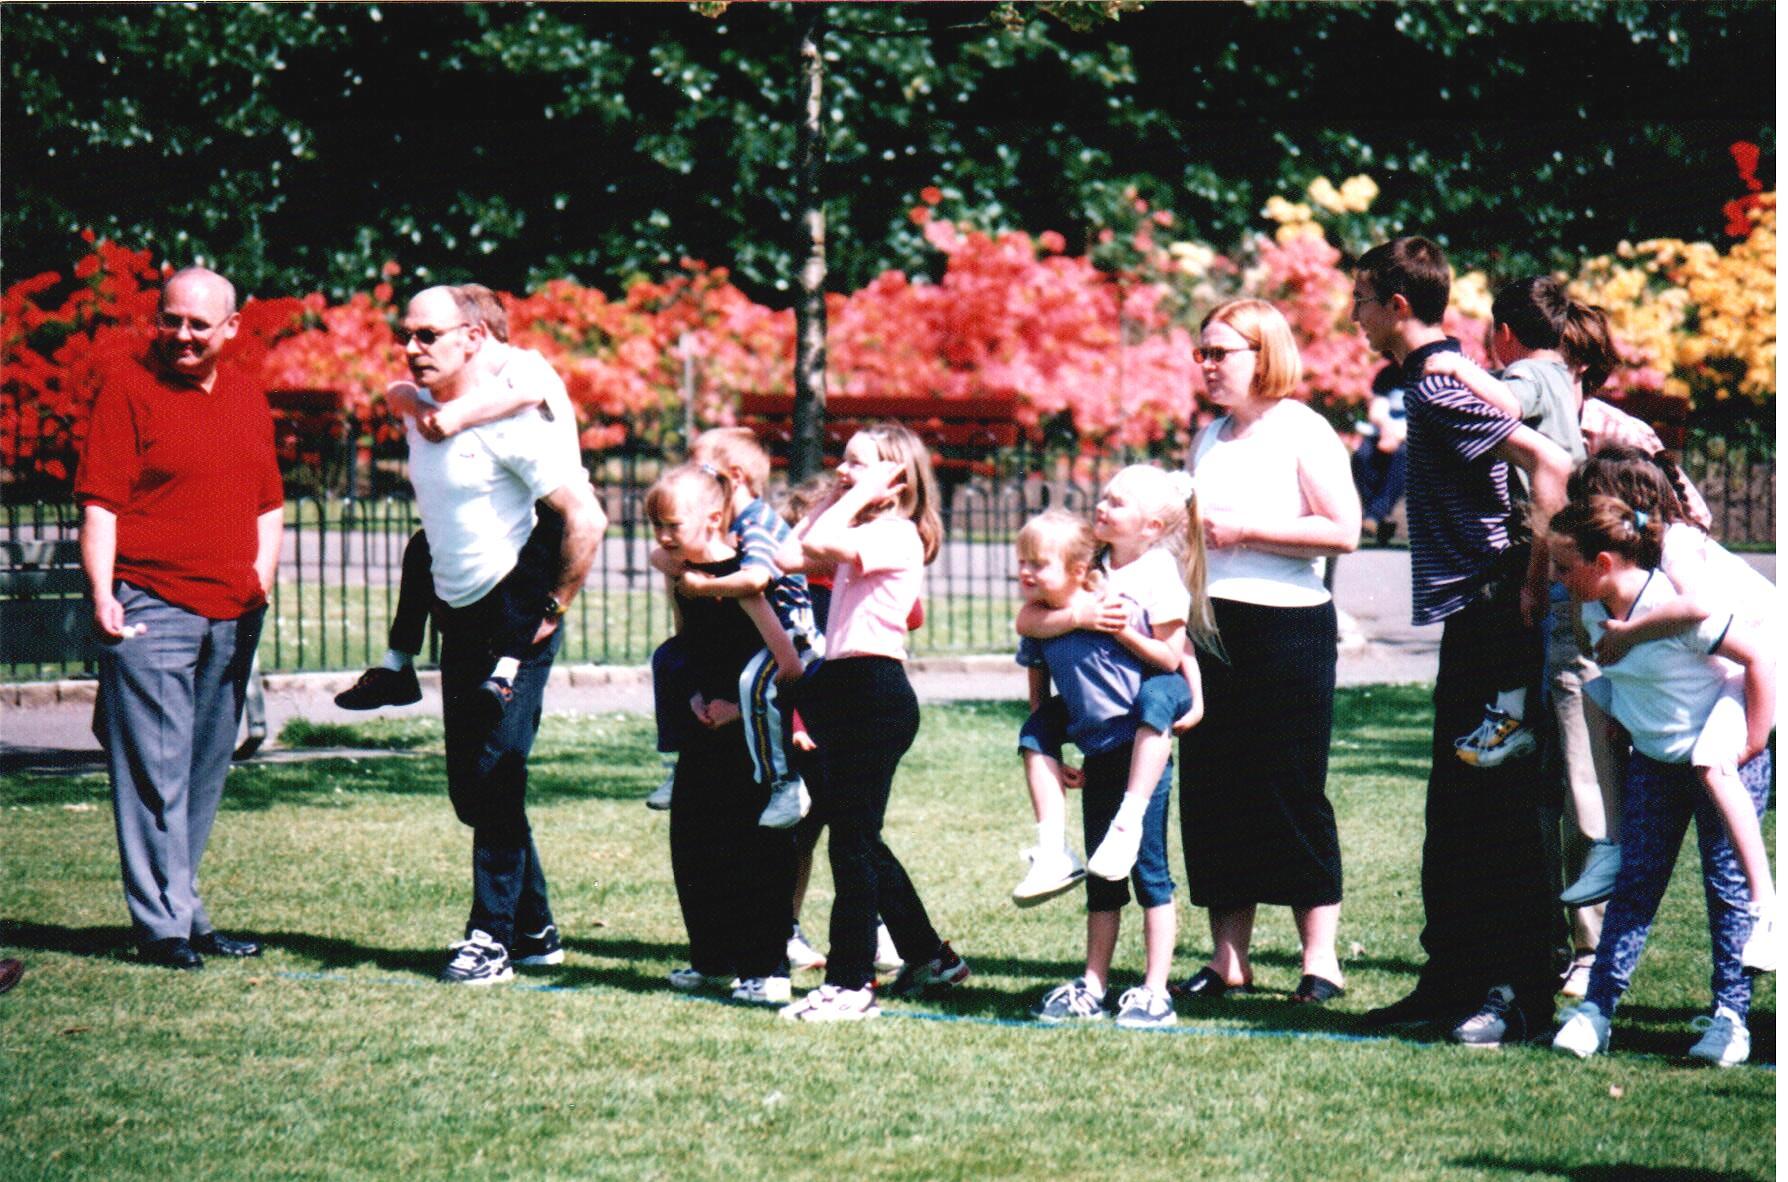 KGH 2001 SS Victoria Park 3.jpeg